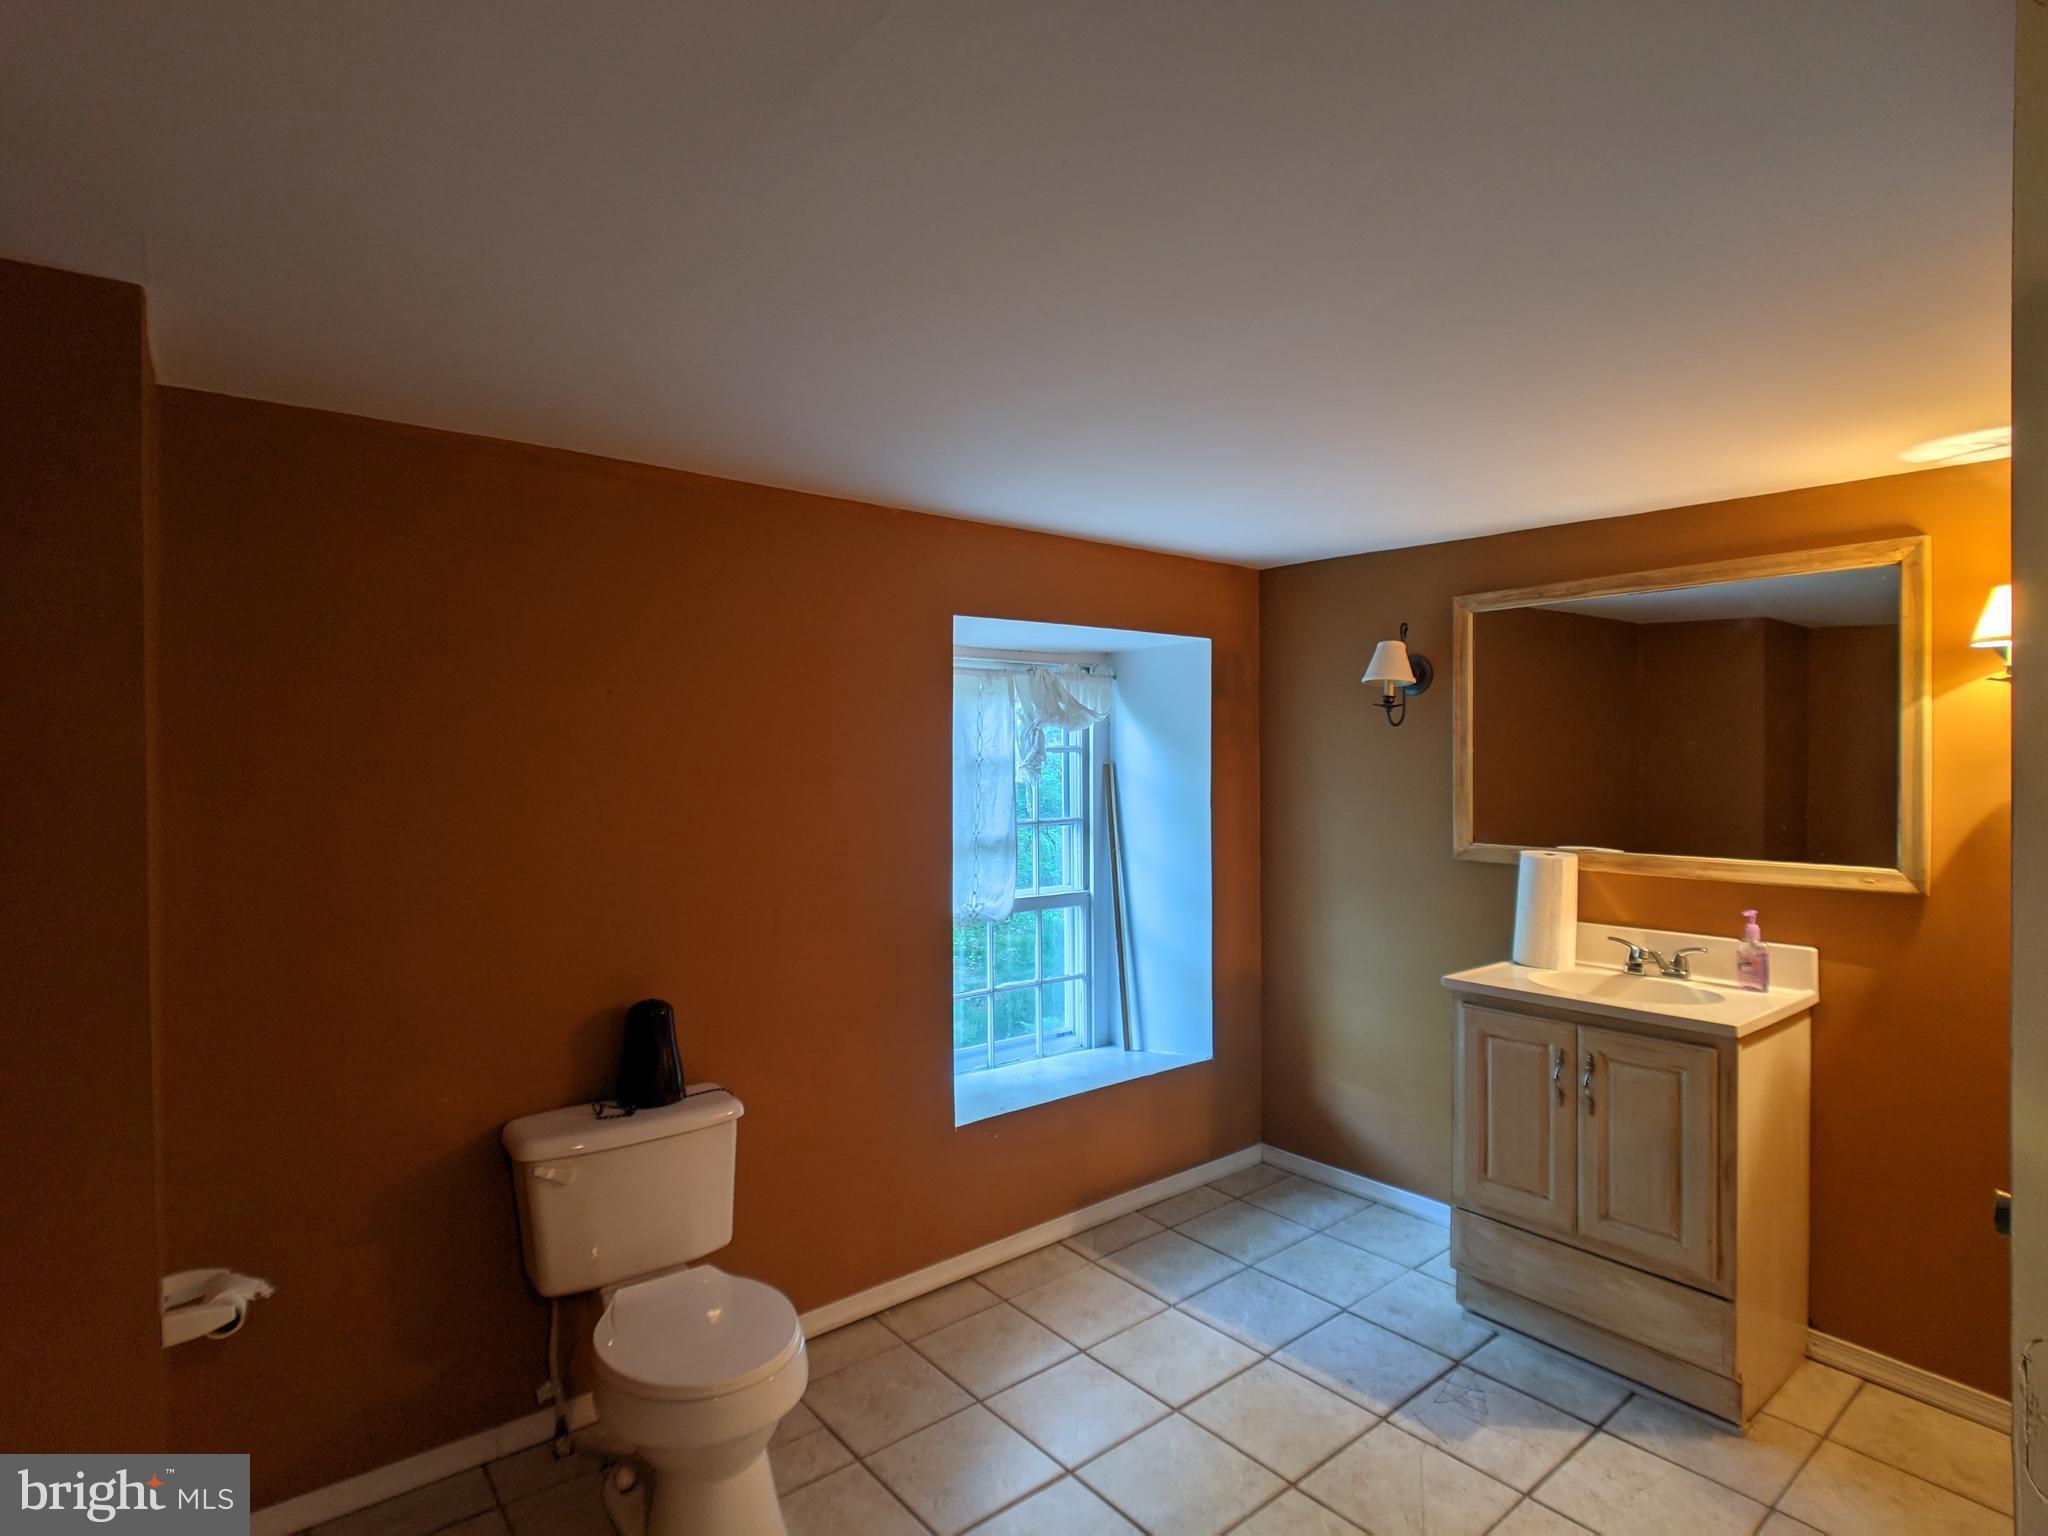 2 half baths in bottom floor of carriage house